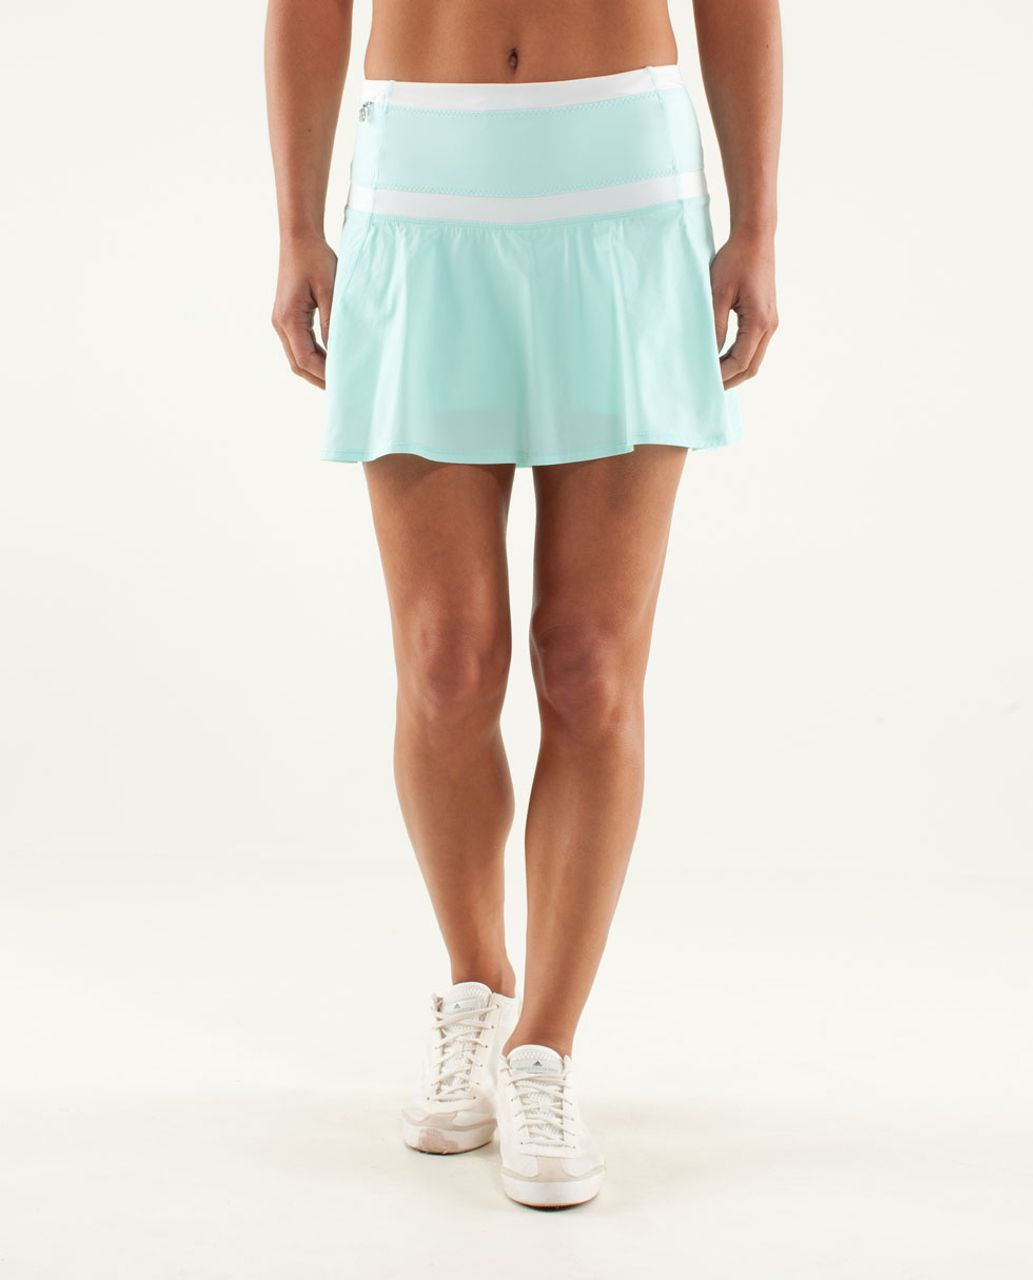 8a16a3ba23 Lululemon Hot Hitter Skirt - Aquamarine / White - lulu fanatics